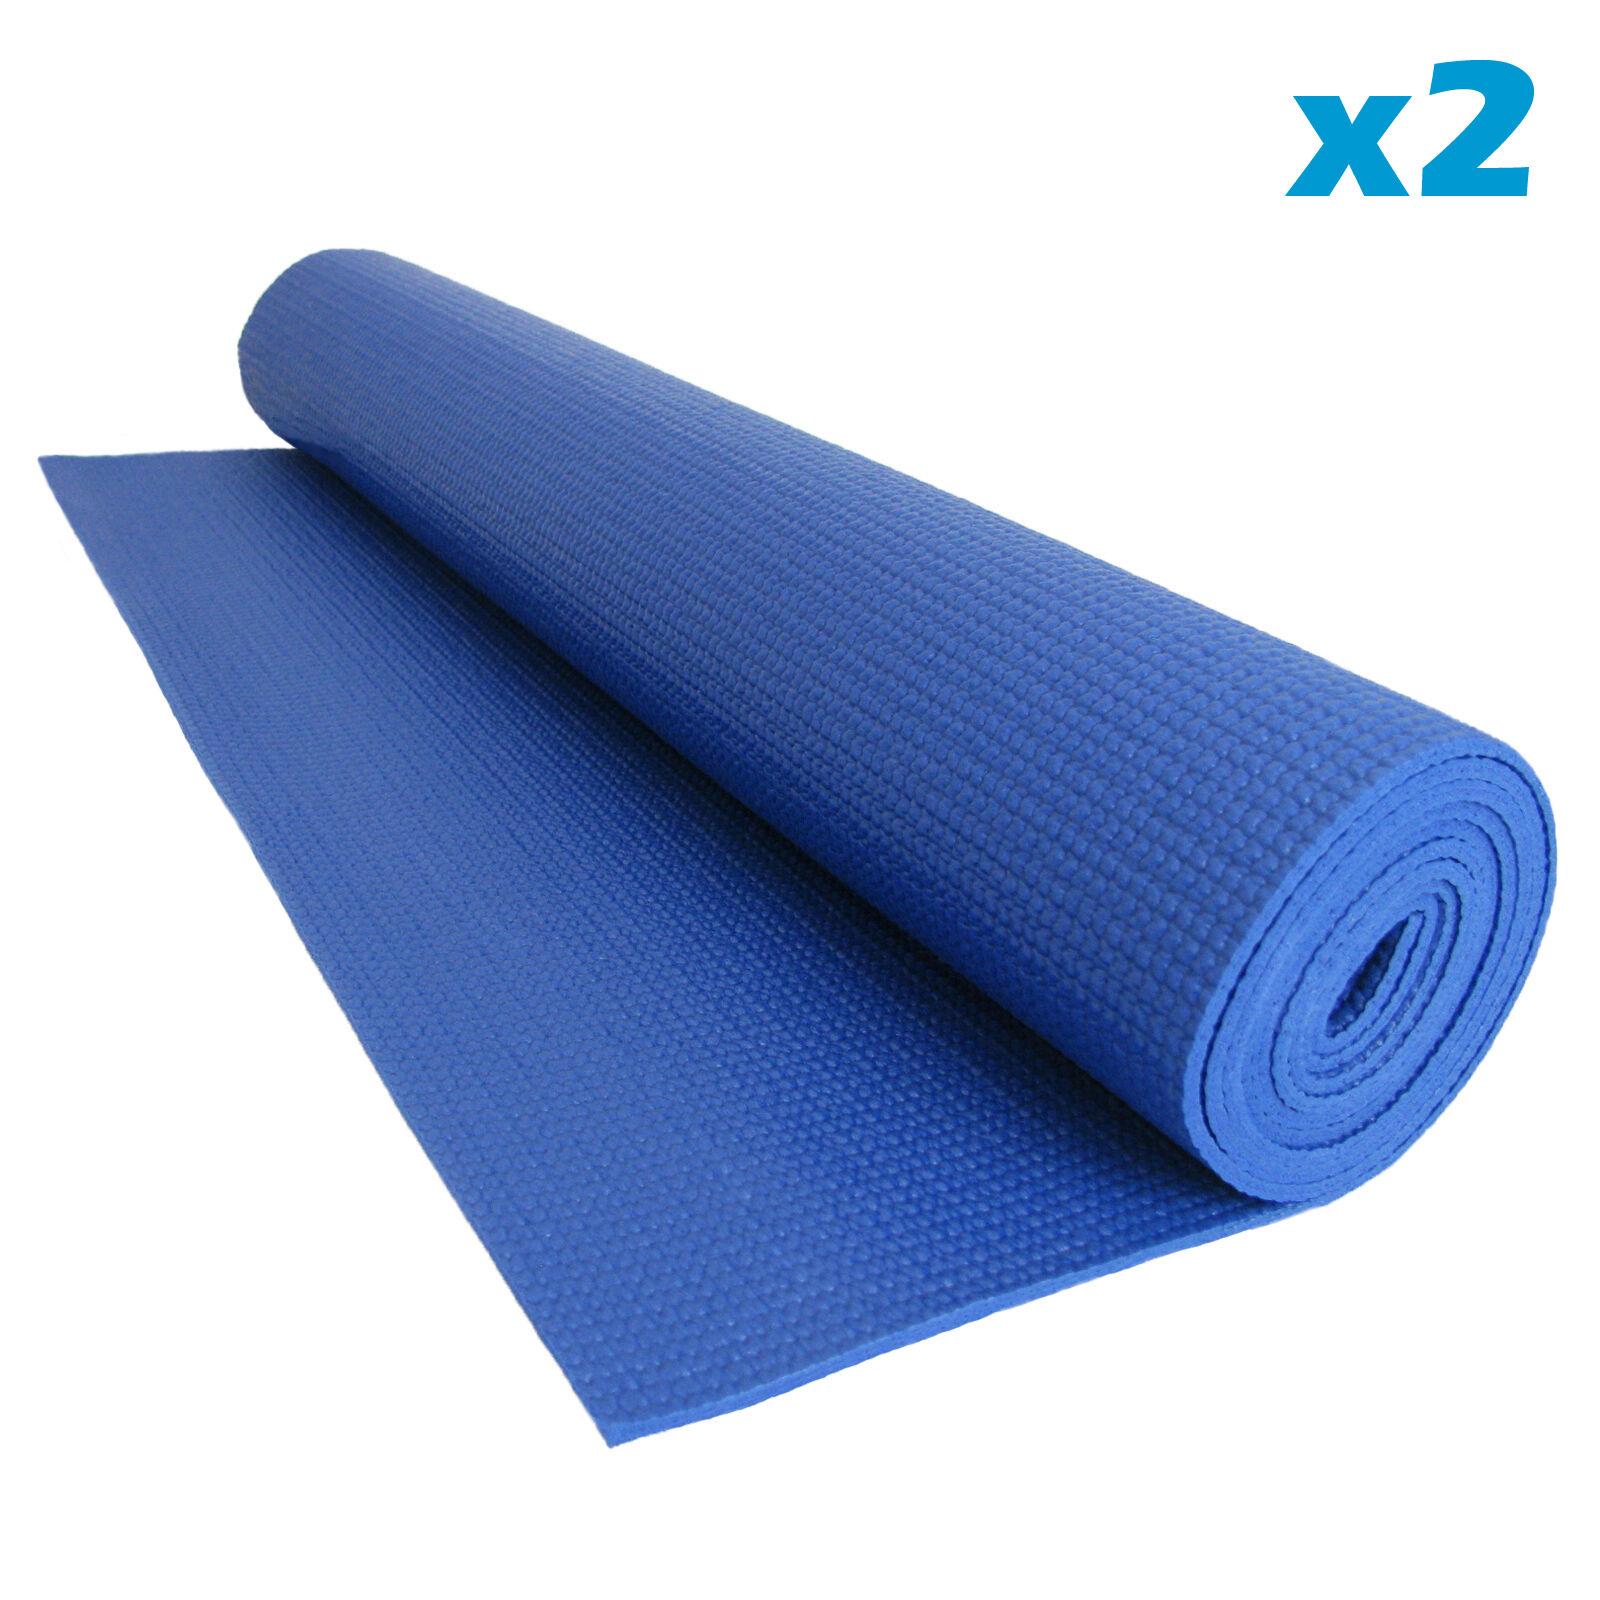 Exercice de Pilates Yoga Tapis Fitness Physio Pilates de Gym Anti-dérapant 3cb73c